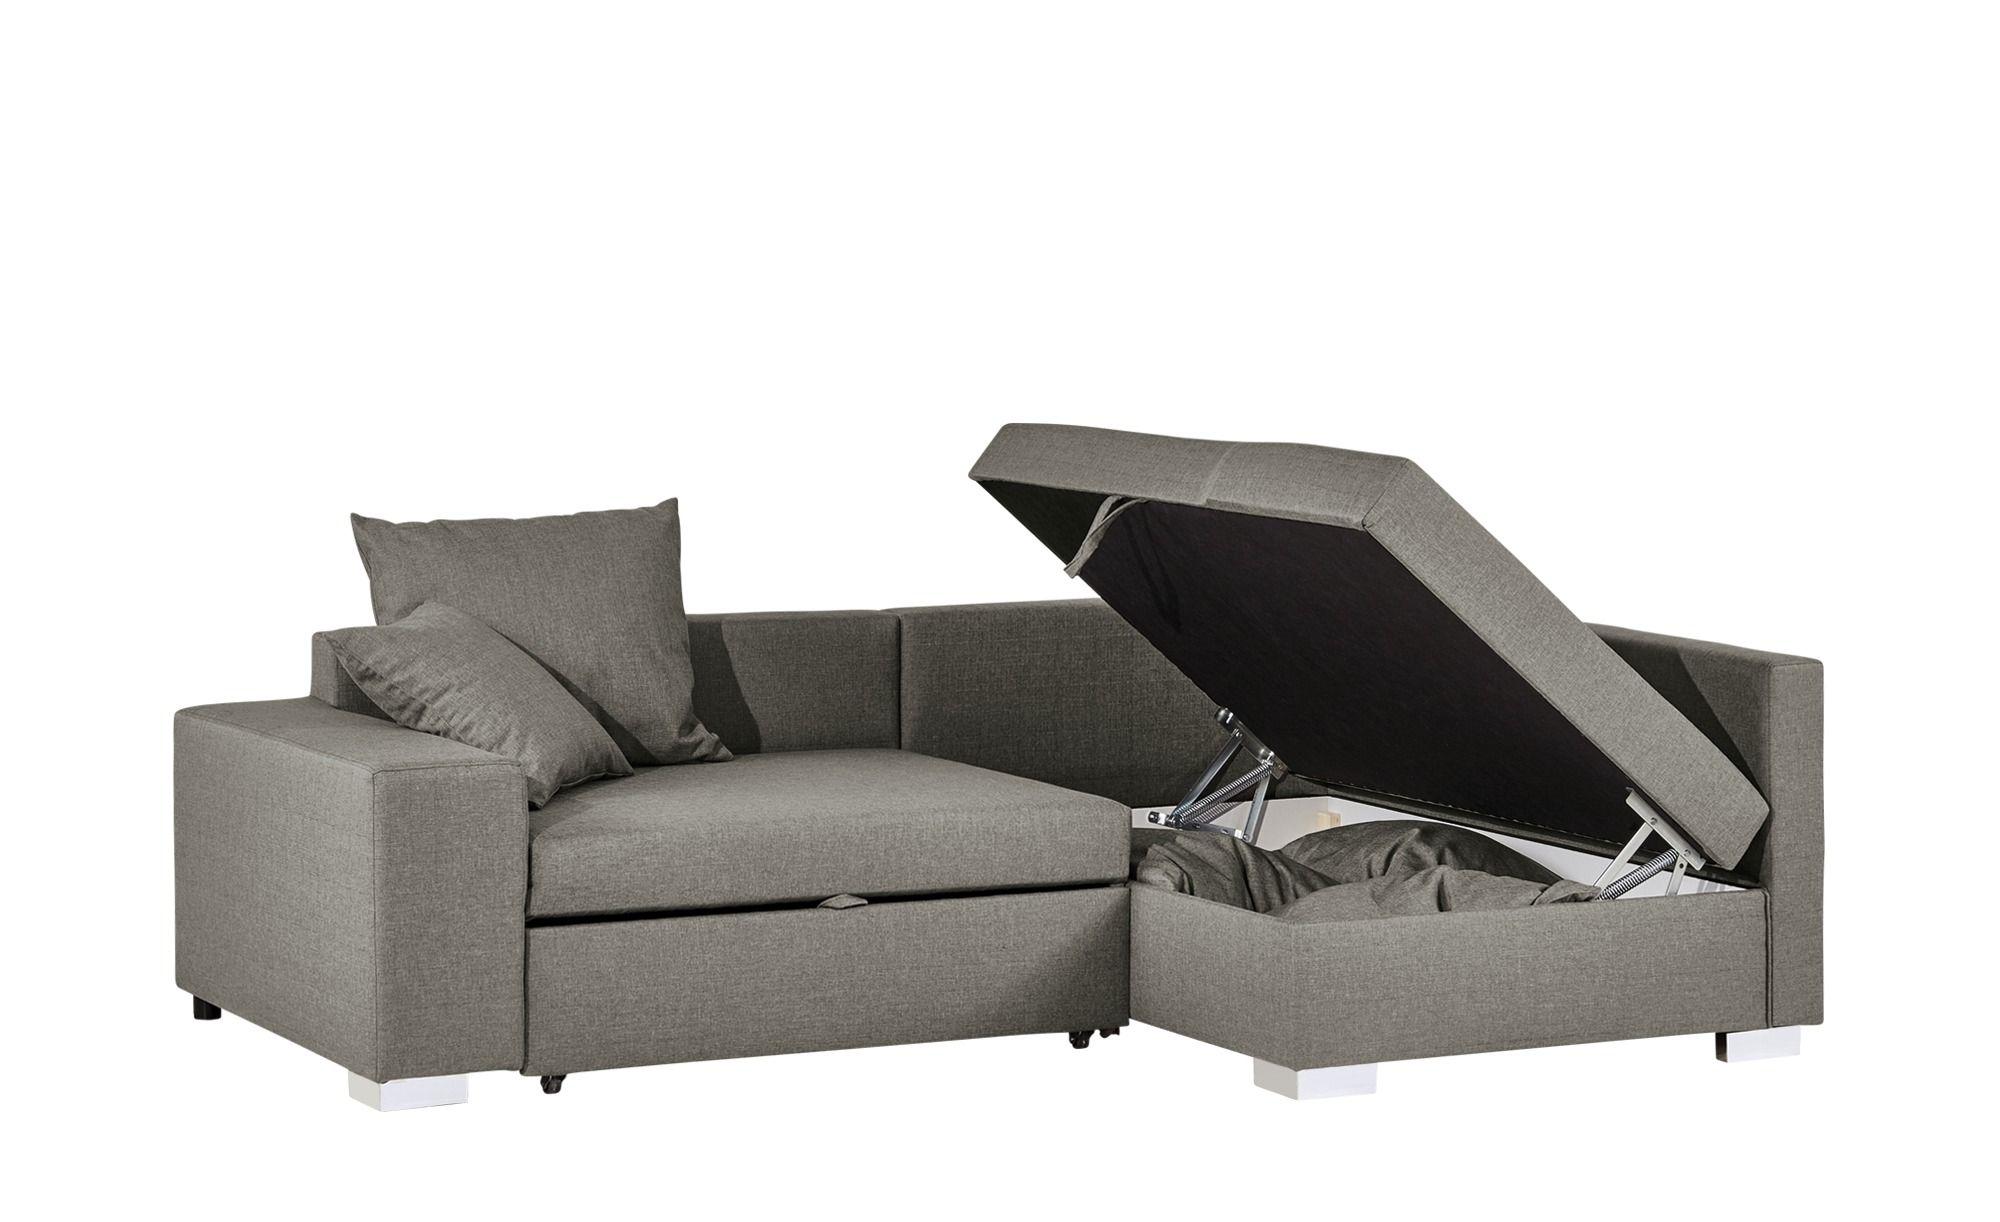 Smart Ecksofa Mit Schlaffunktion Lena Gefunden Bei Mobel Hoffner Sofa Mit Relaxfunktion Big Sofa Mit Schlaffunktion Sofa Design